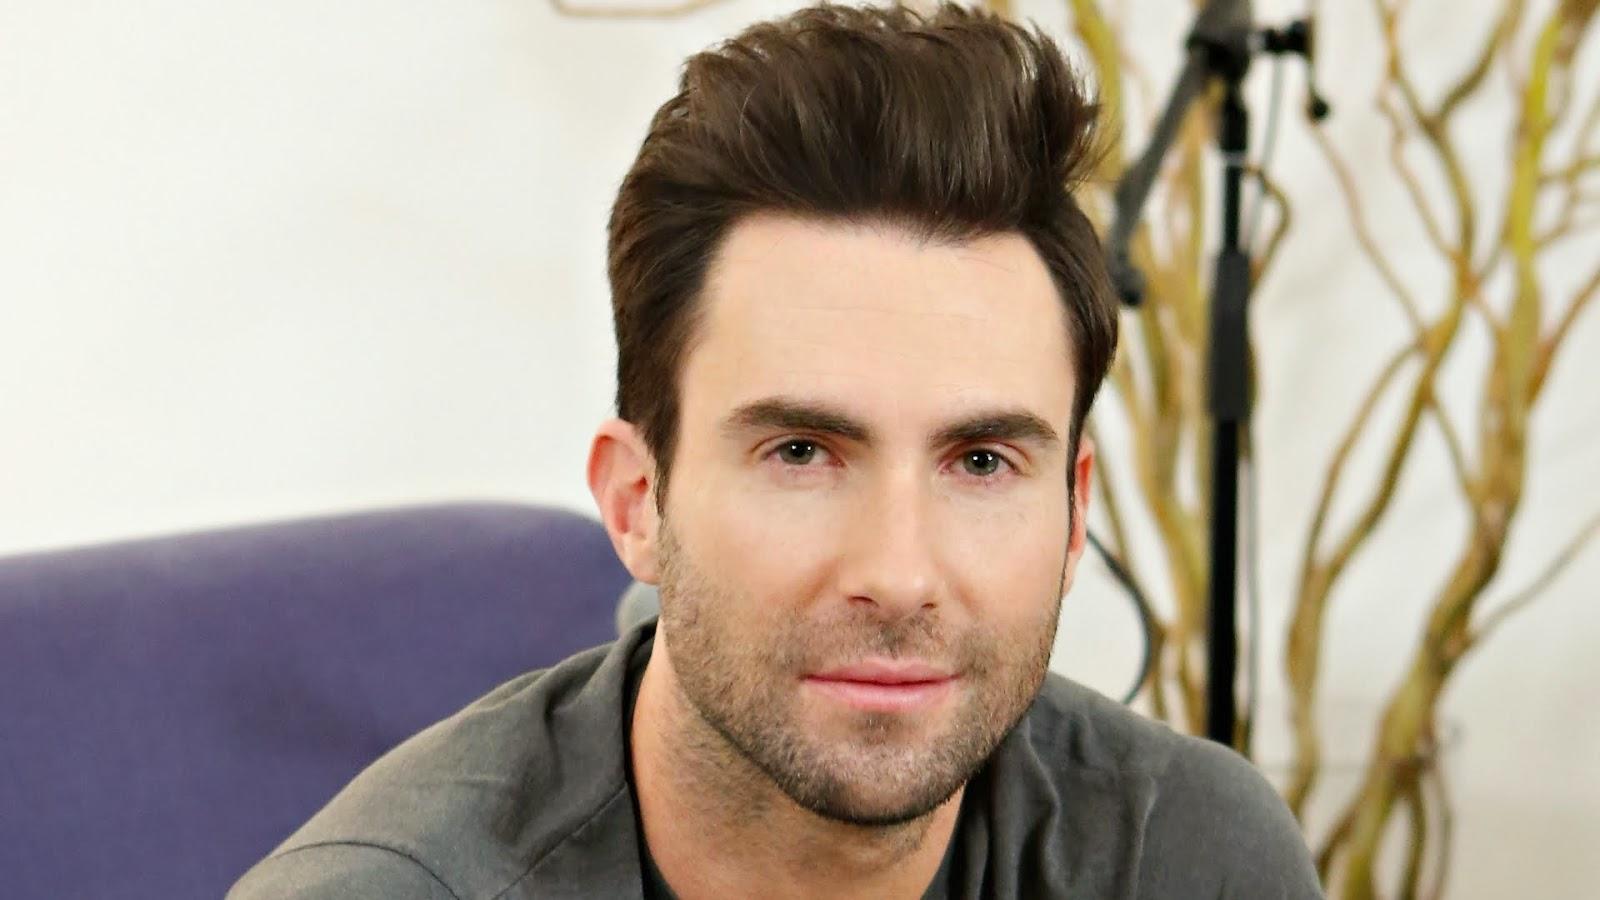 Maroon 5 Hairstyle: Stylish HD Wallpaper